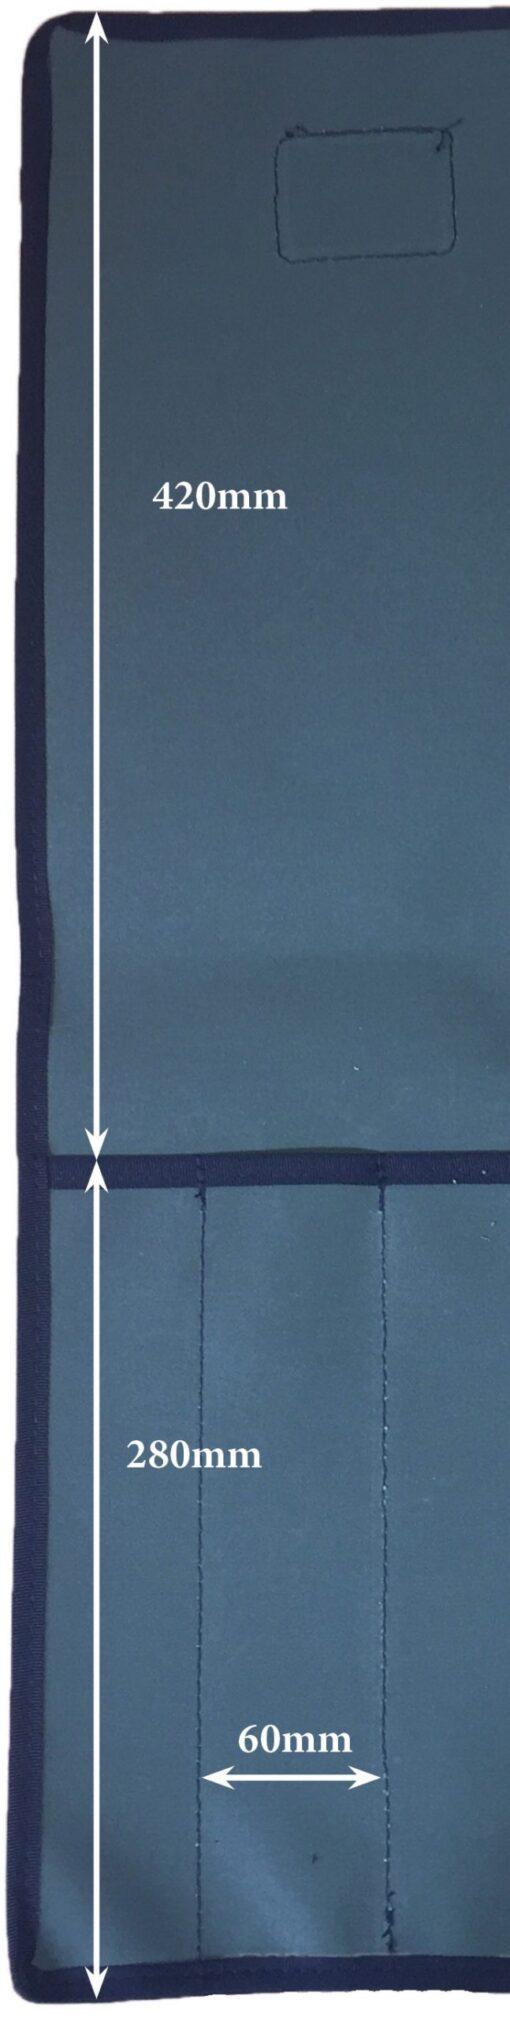 AOS Tool & Knife Wrap - Green Canvas – 12 Piece